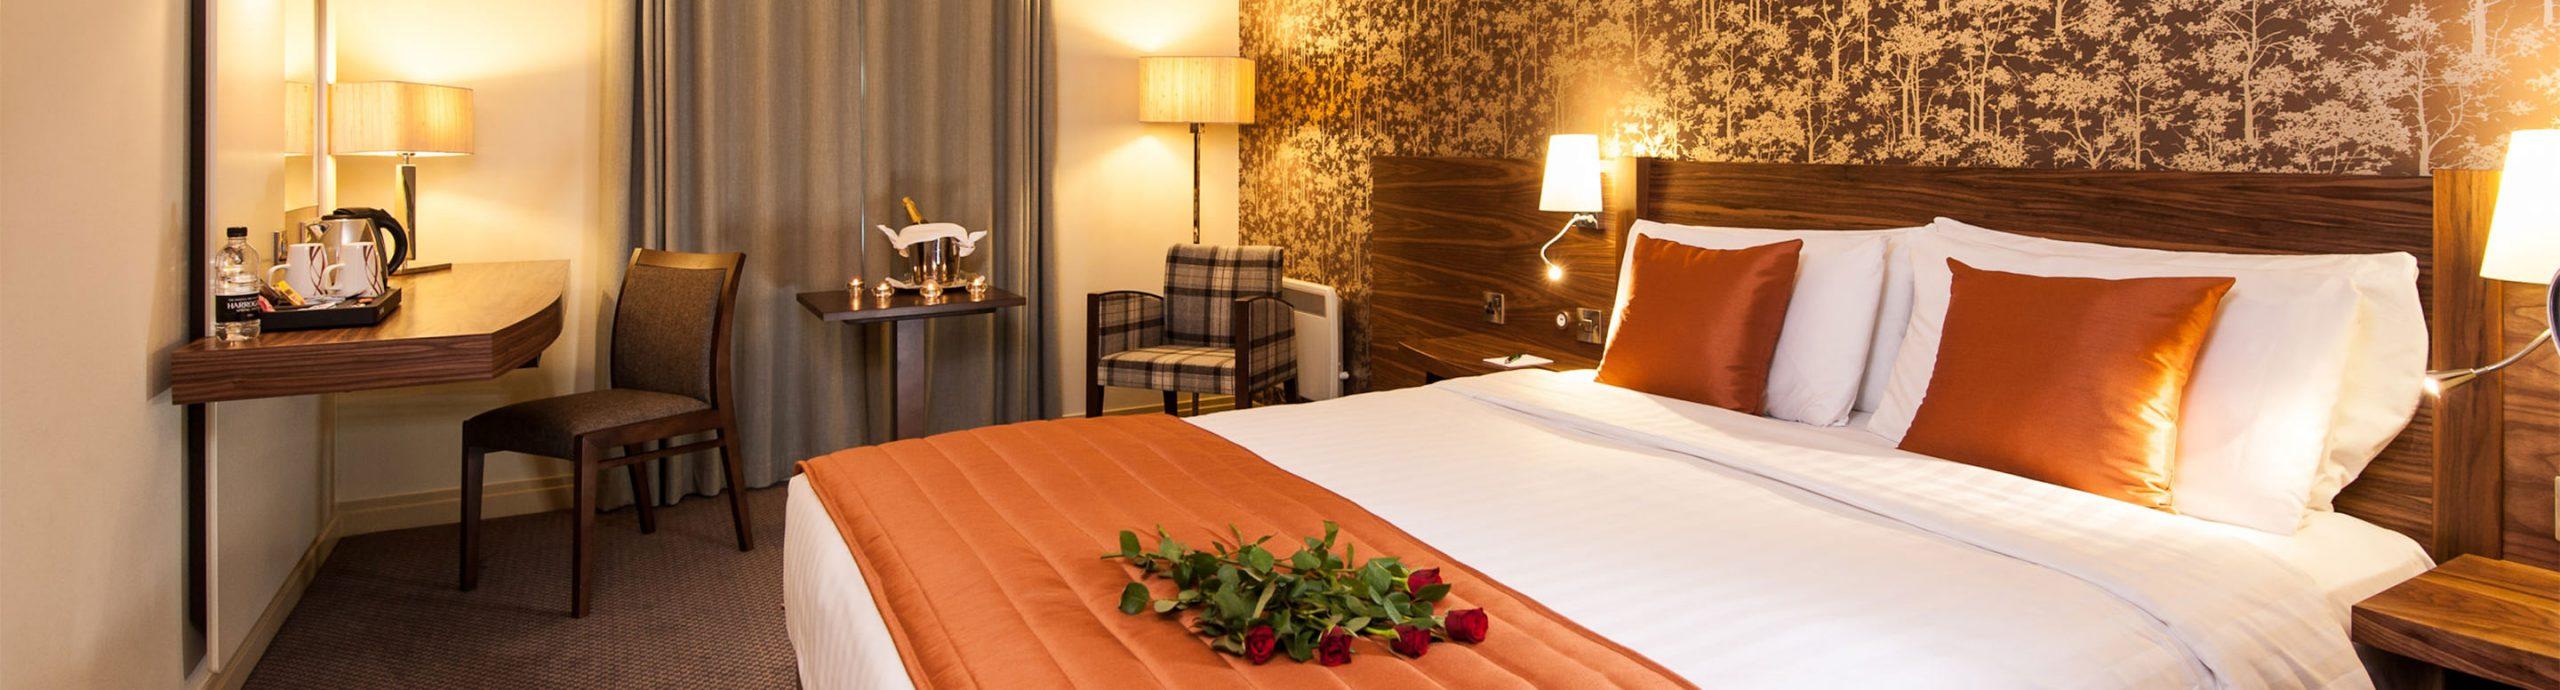 Romantic Guestroom